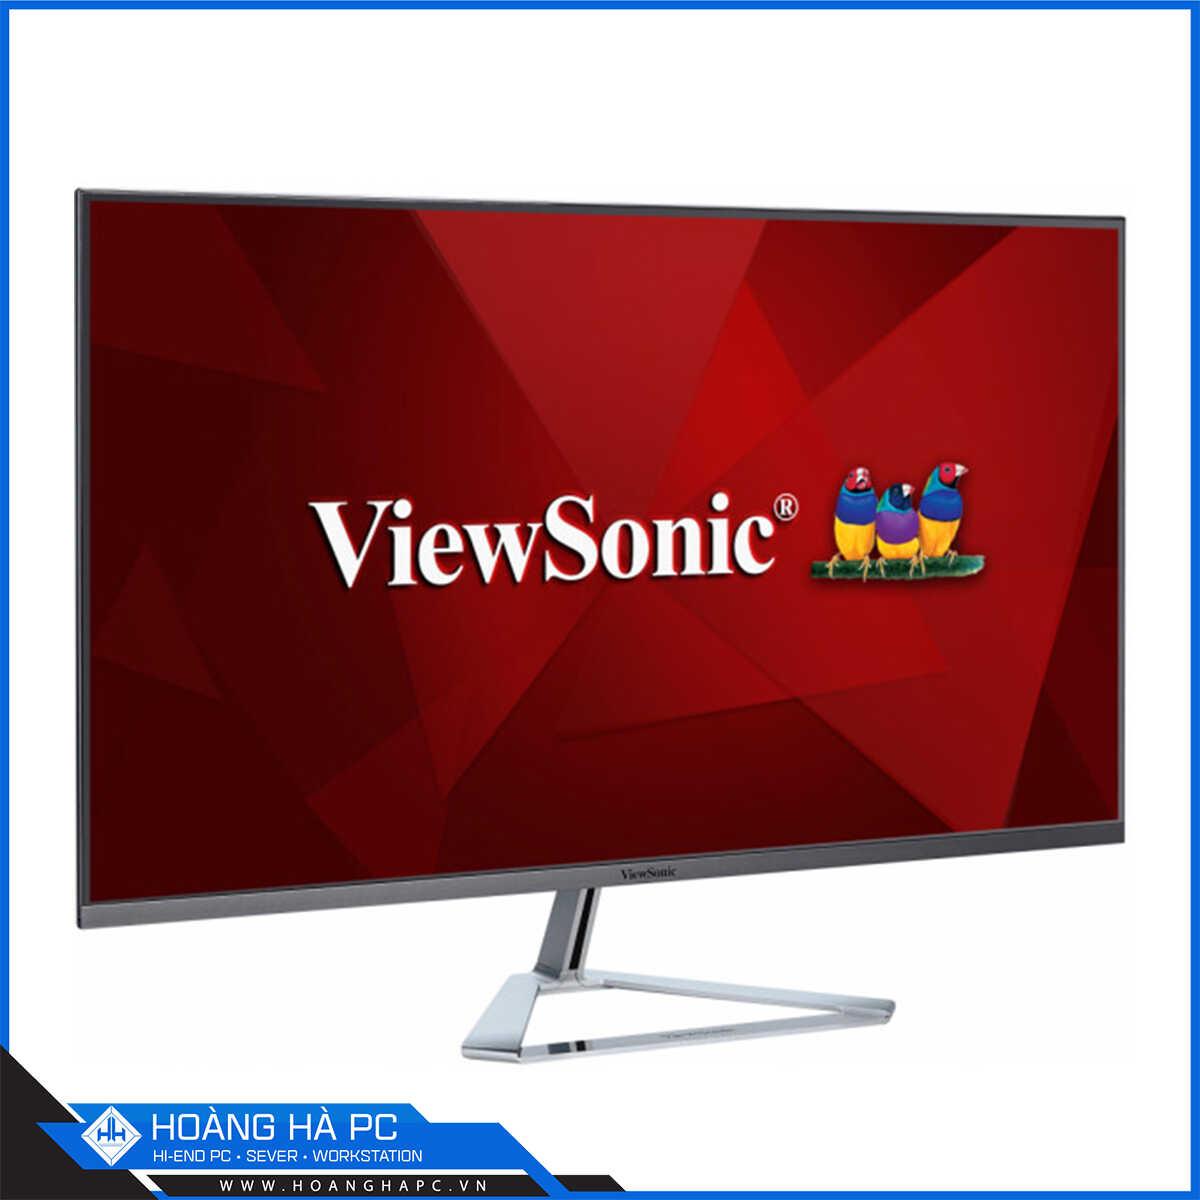 Viewsonic VX2776-SMHD